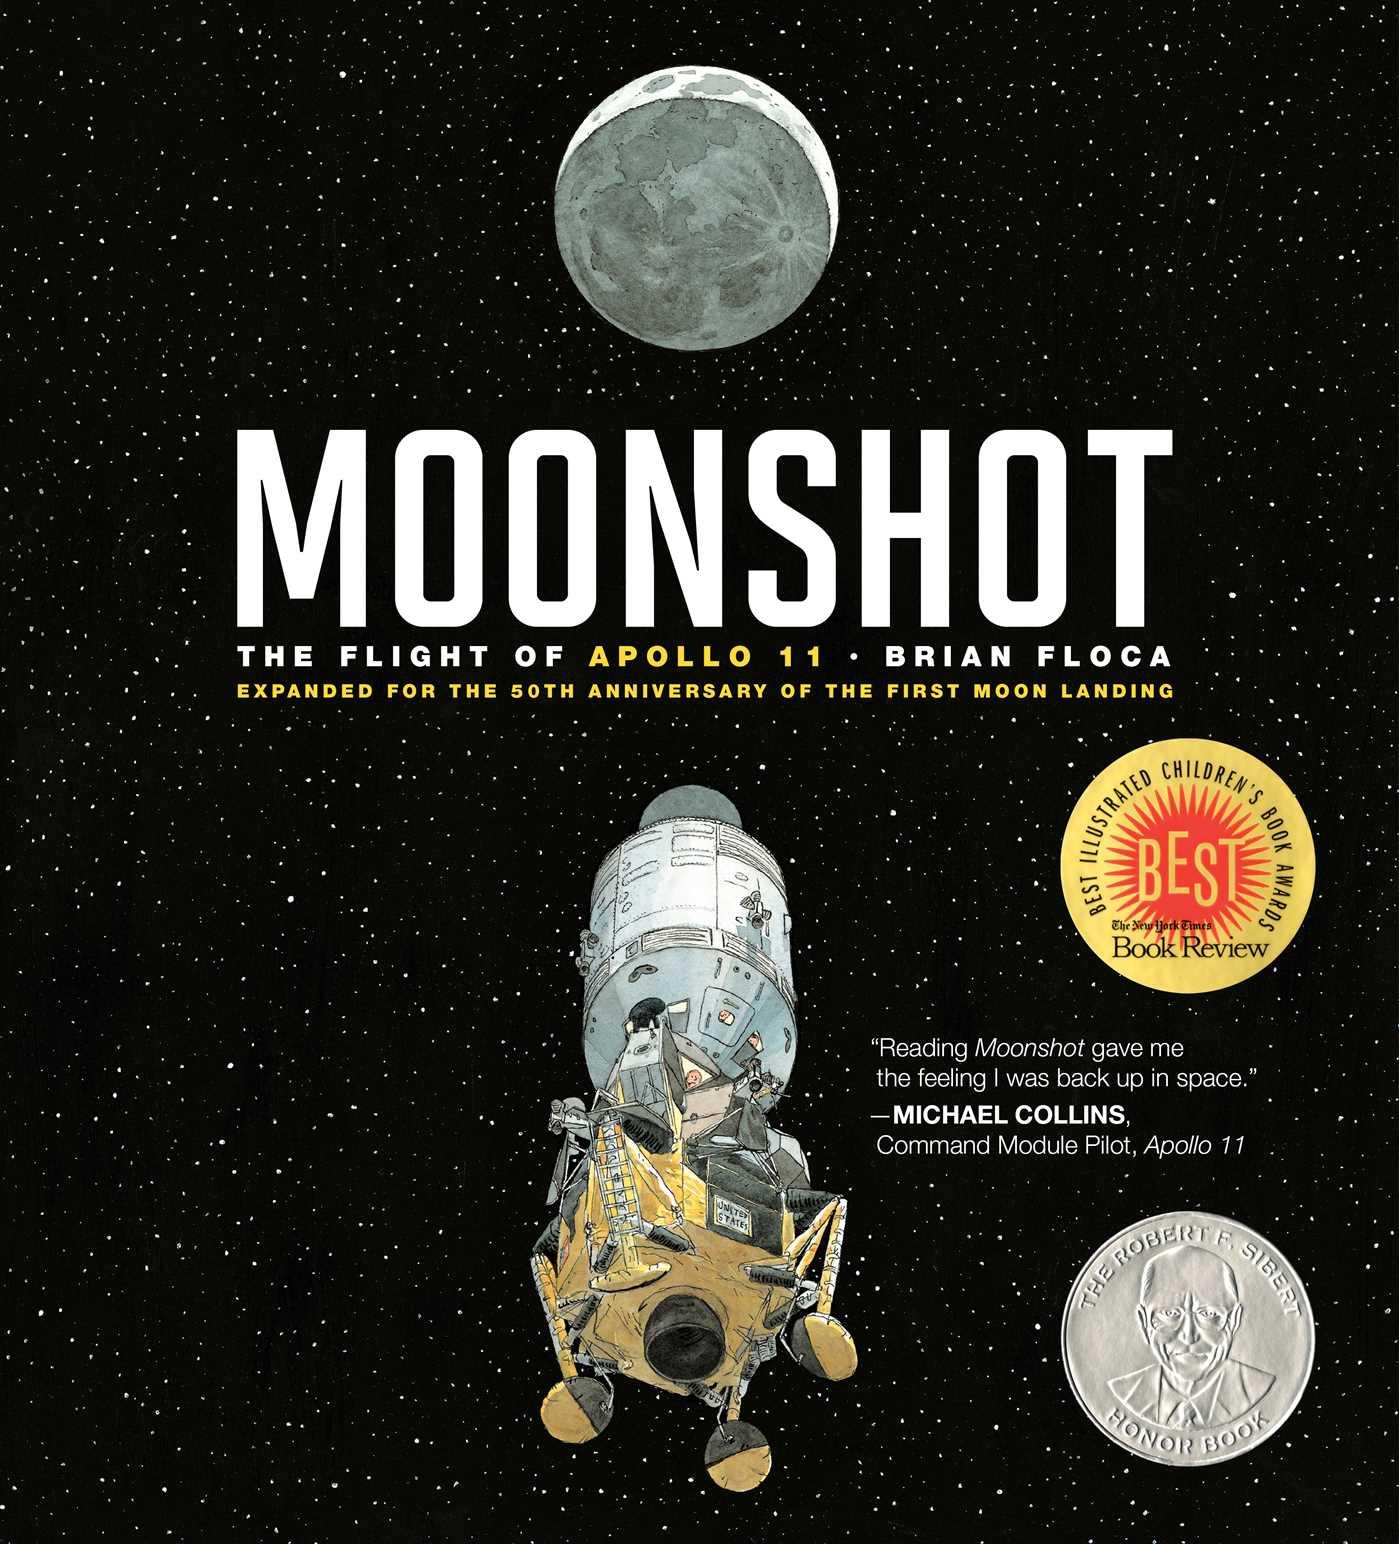 Moonshot 9781534440517 hr